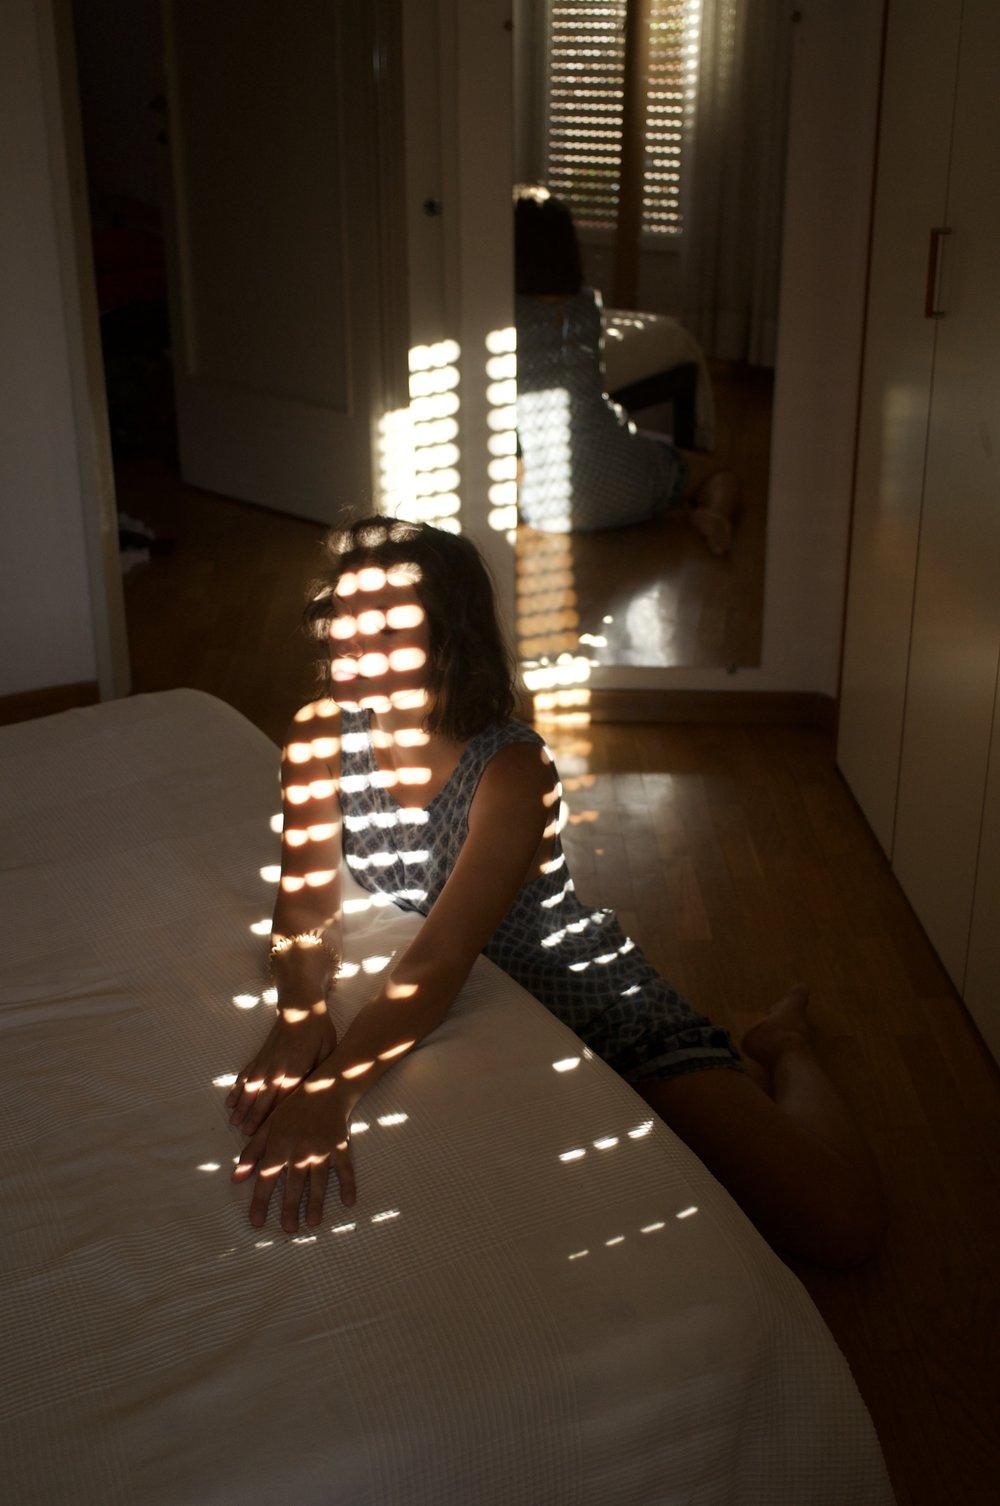 lightdotsclosedeyes.jpg